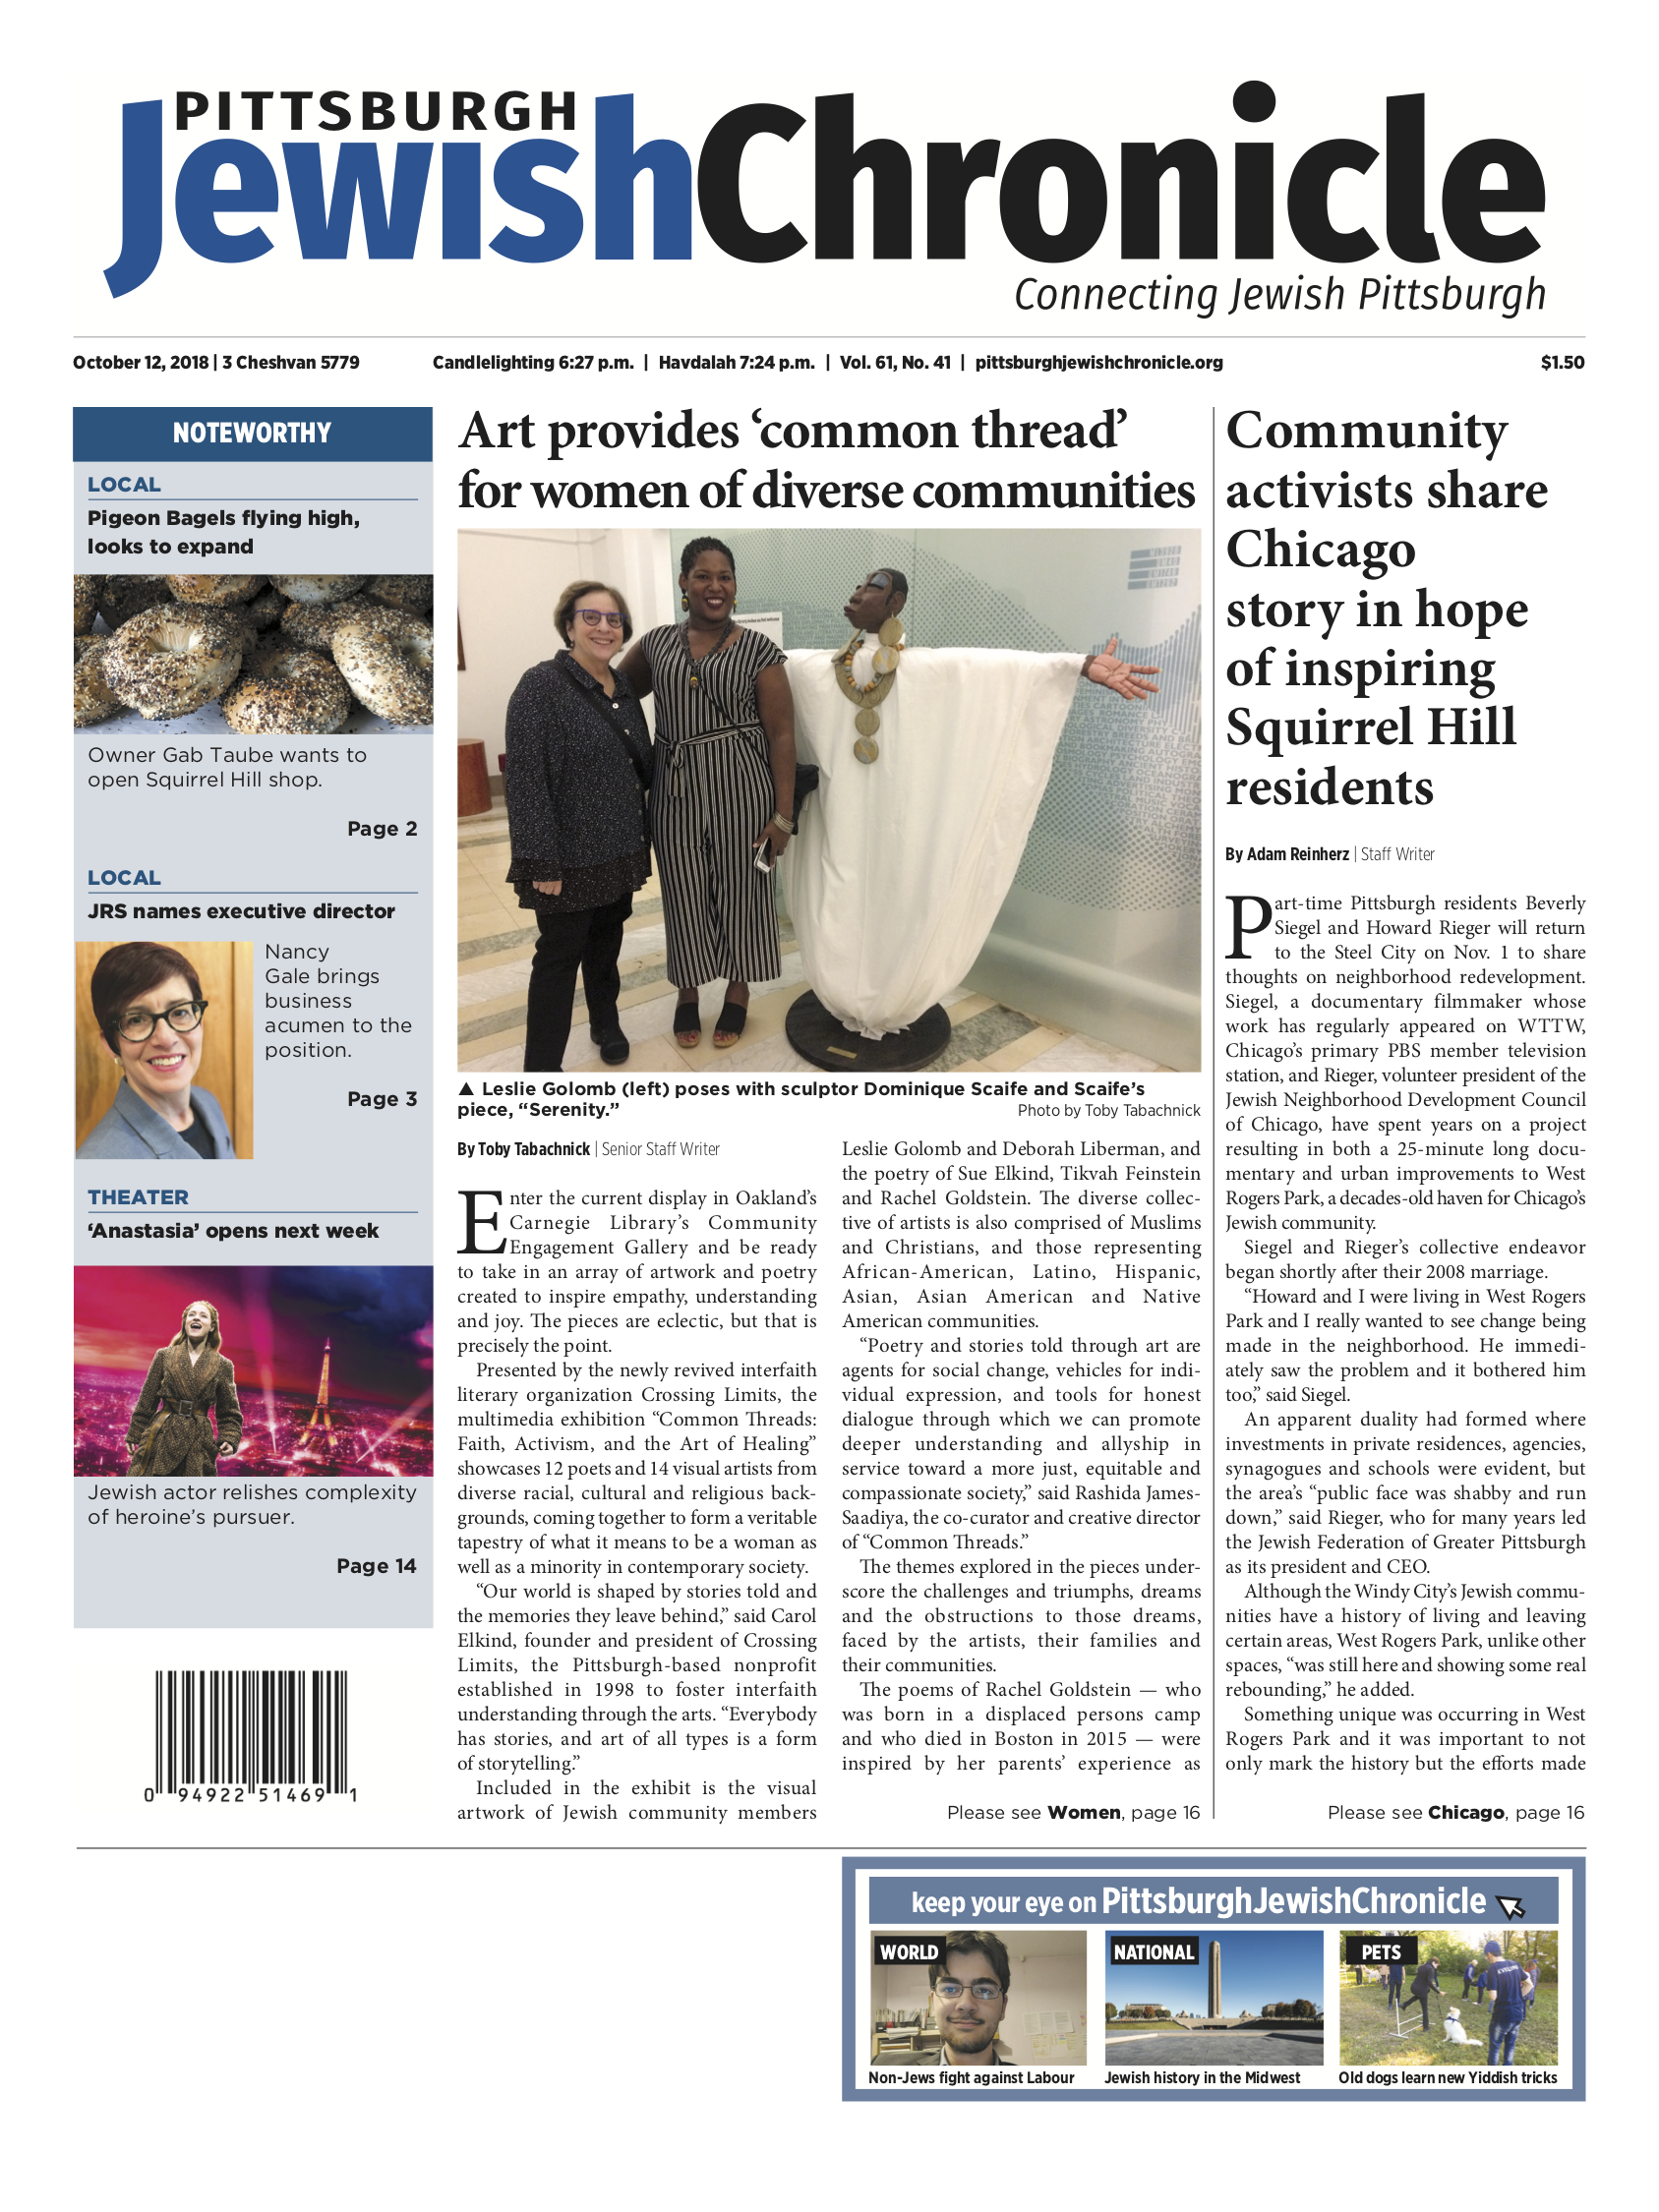 Pittsburgh Jewish Chronicle 10/12/2018